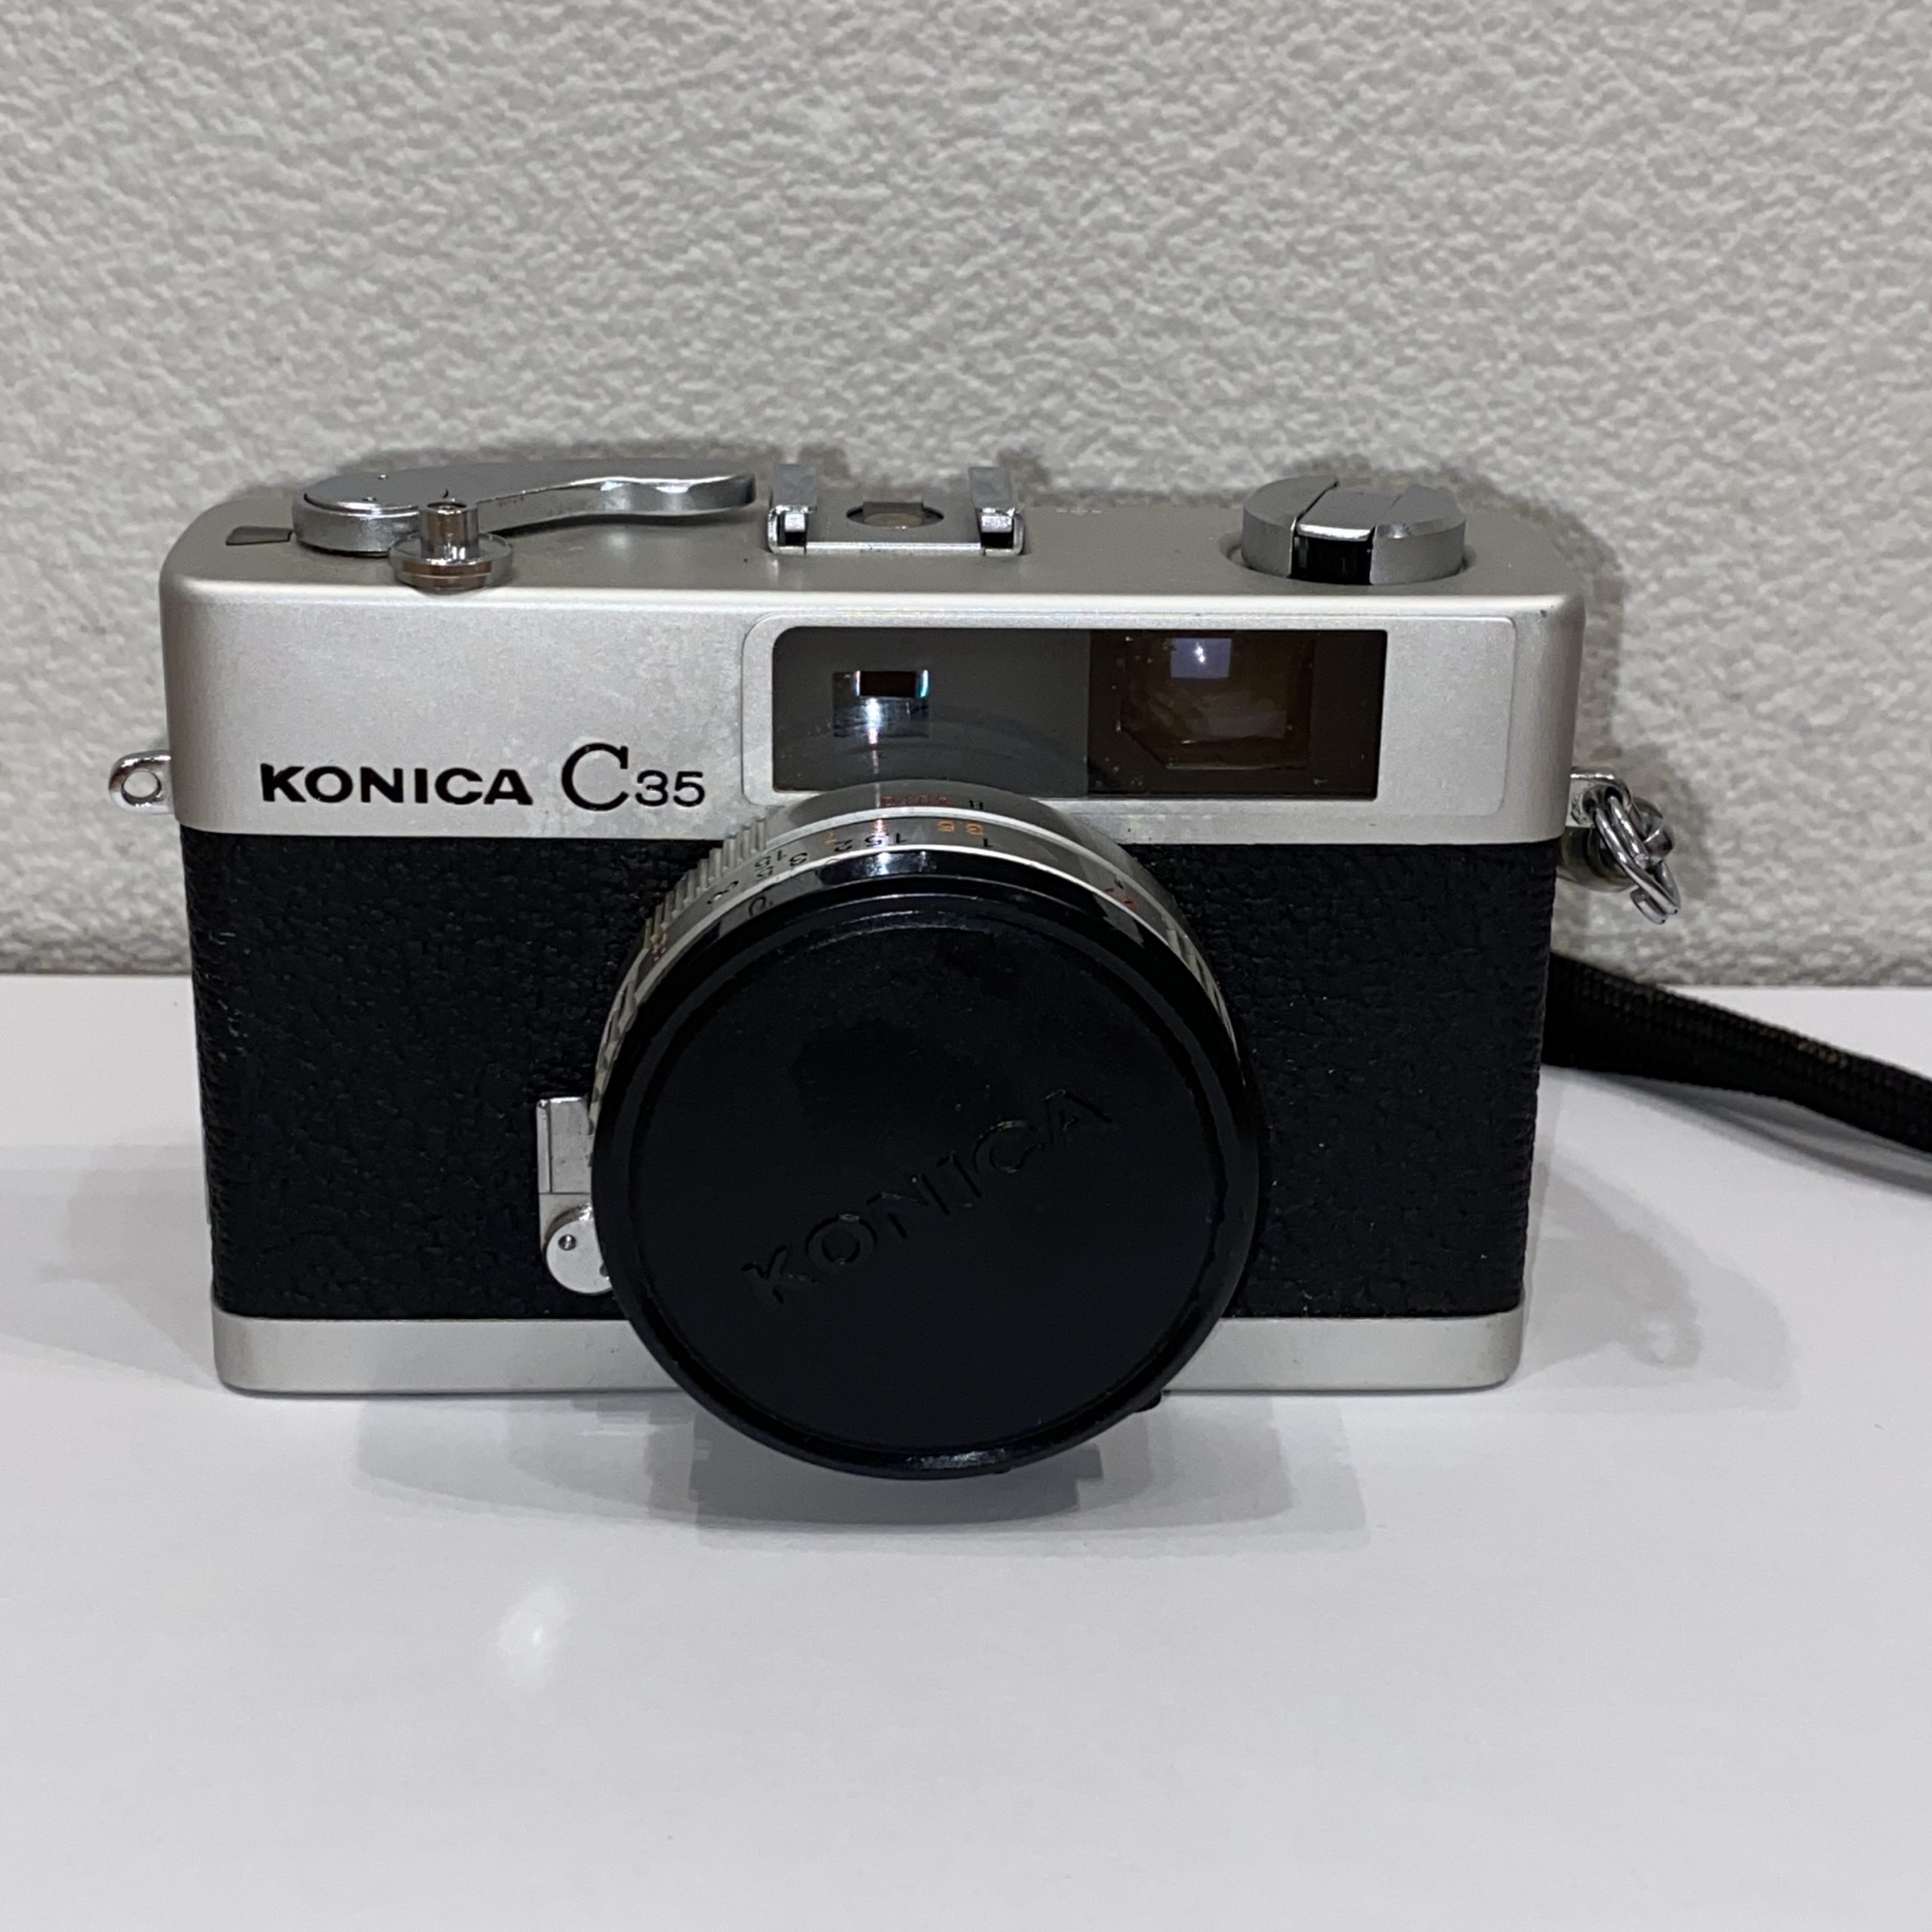 【Konica/コニカ】C35 AF2/オートフォーカス フィルムカメラ